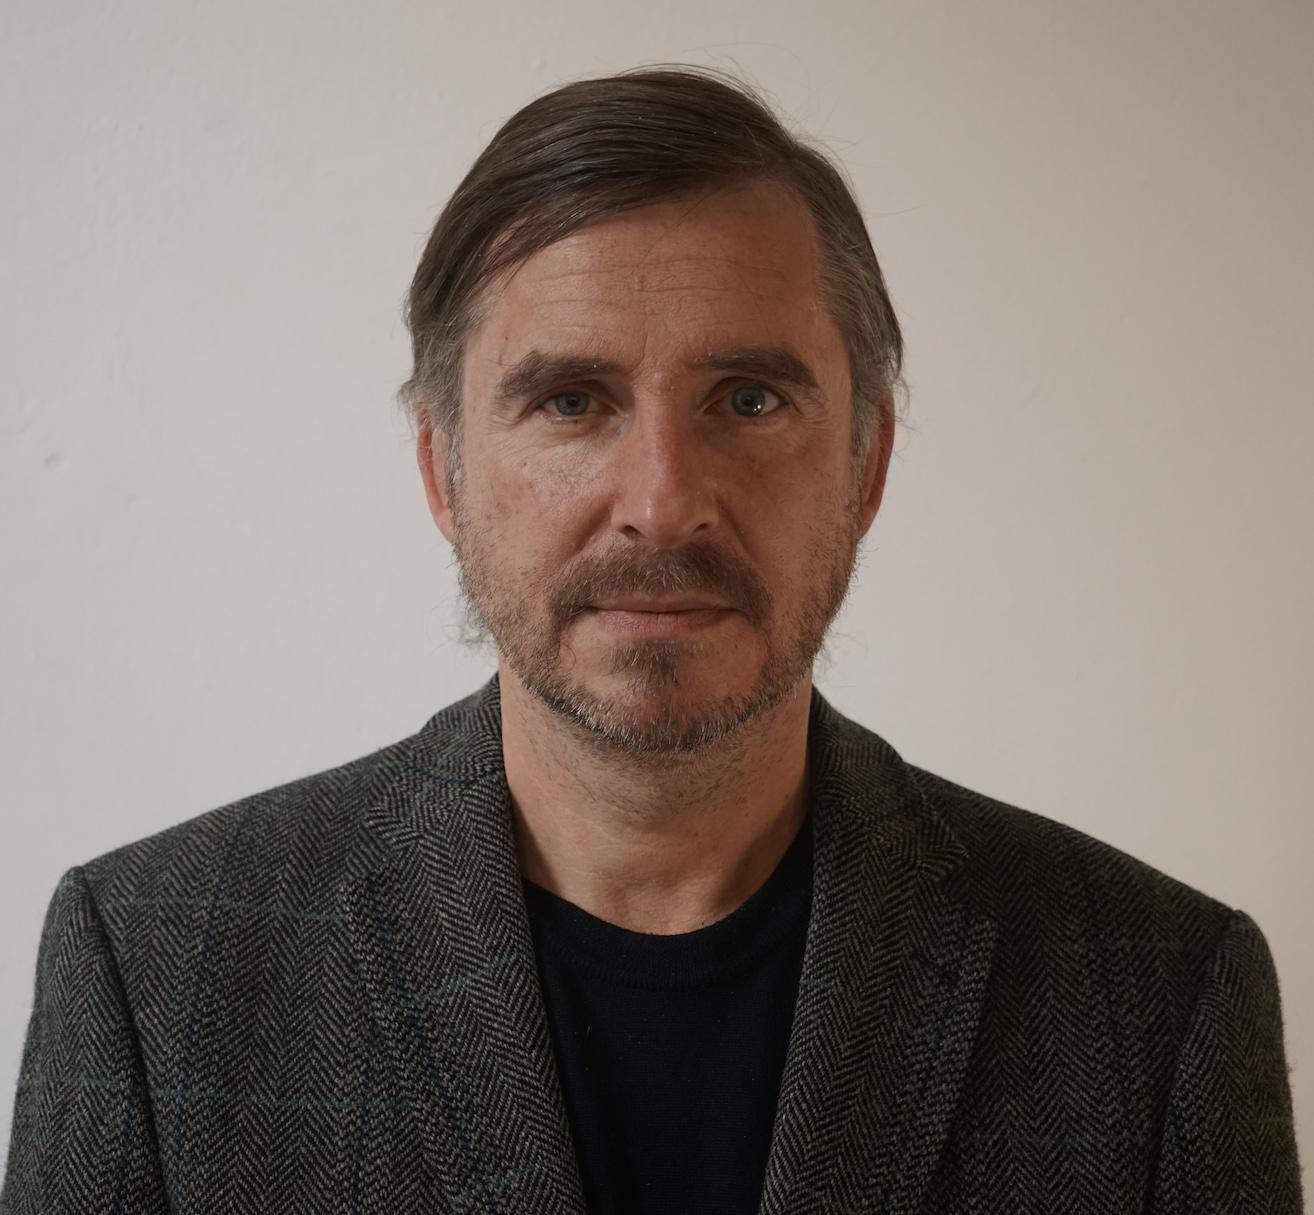 Michael kerkmann